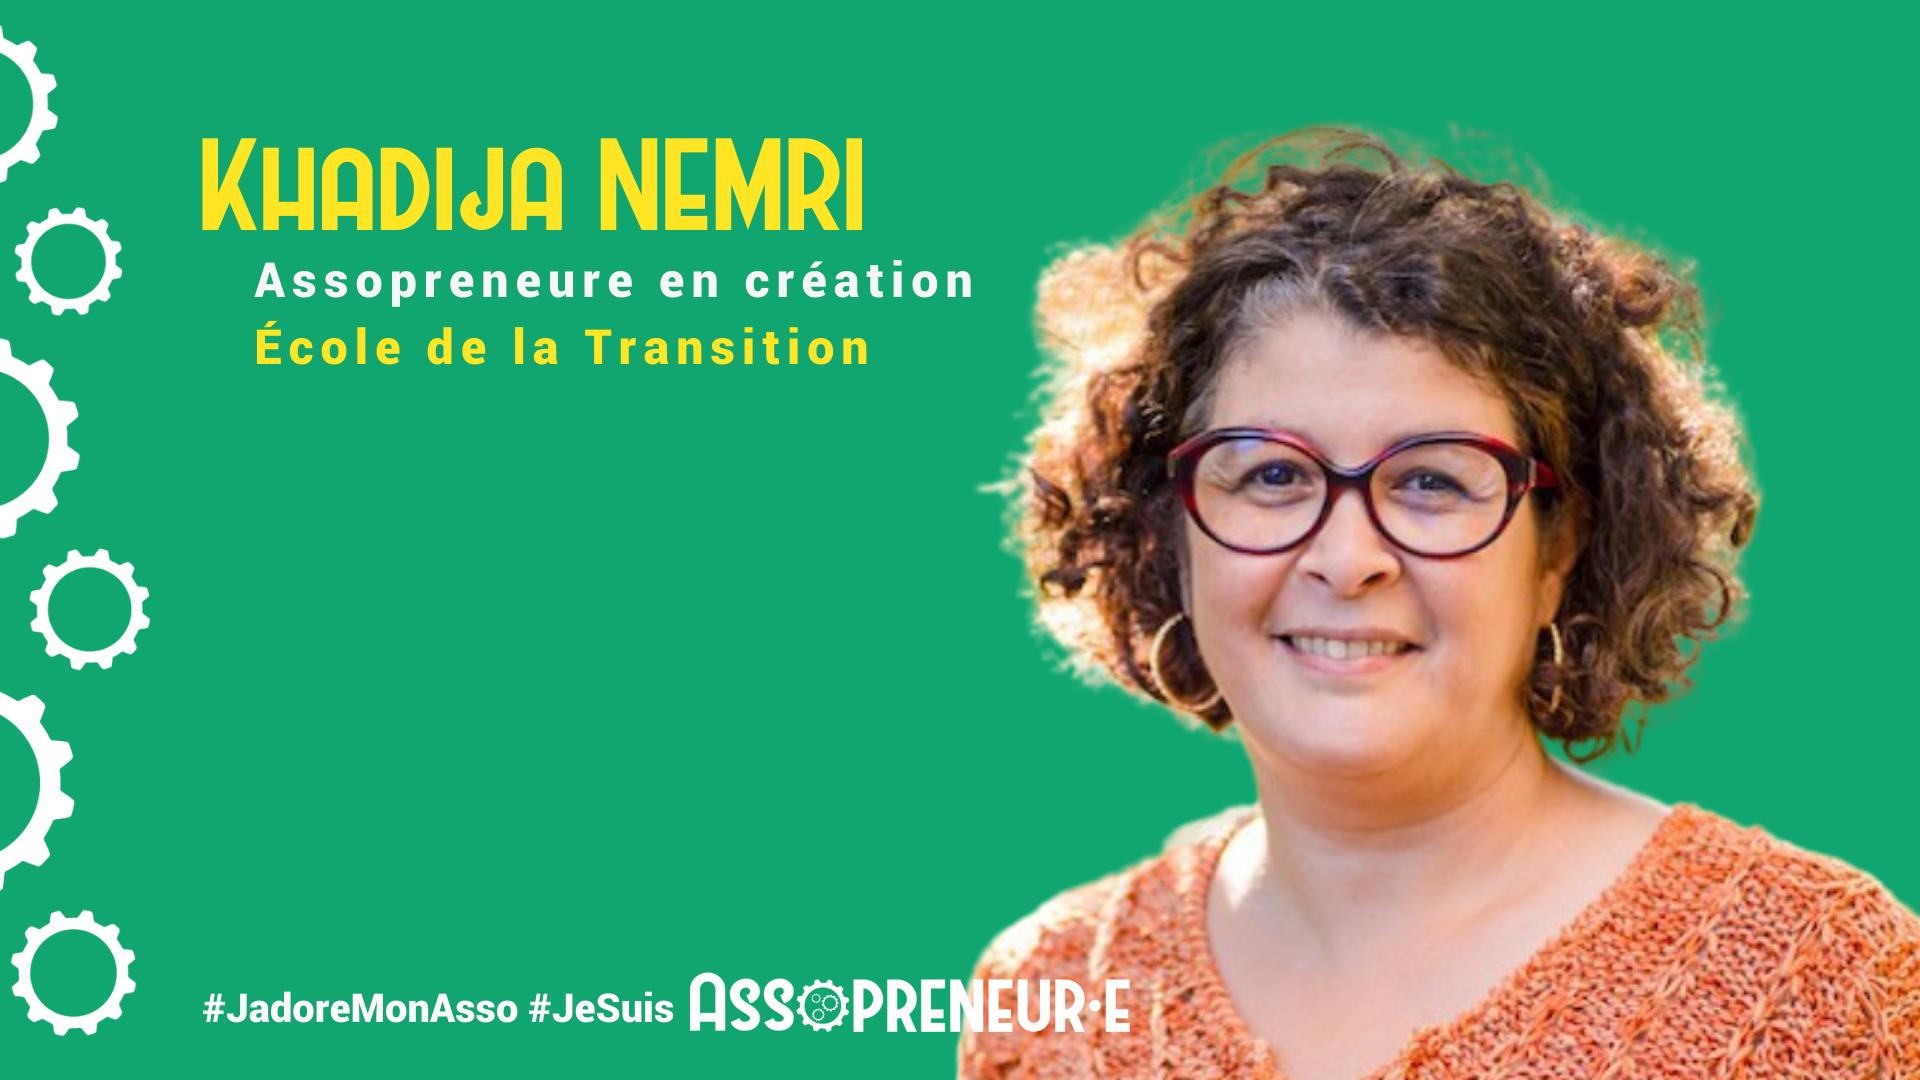 Khadija NEMRI membre programme Assopreneur